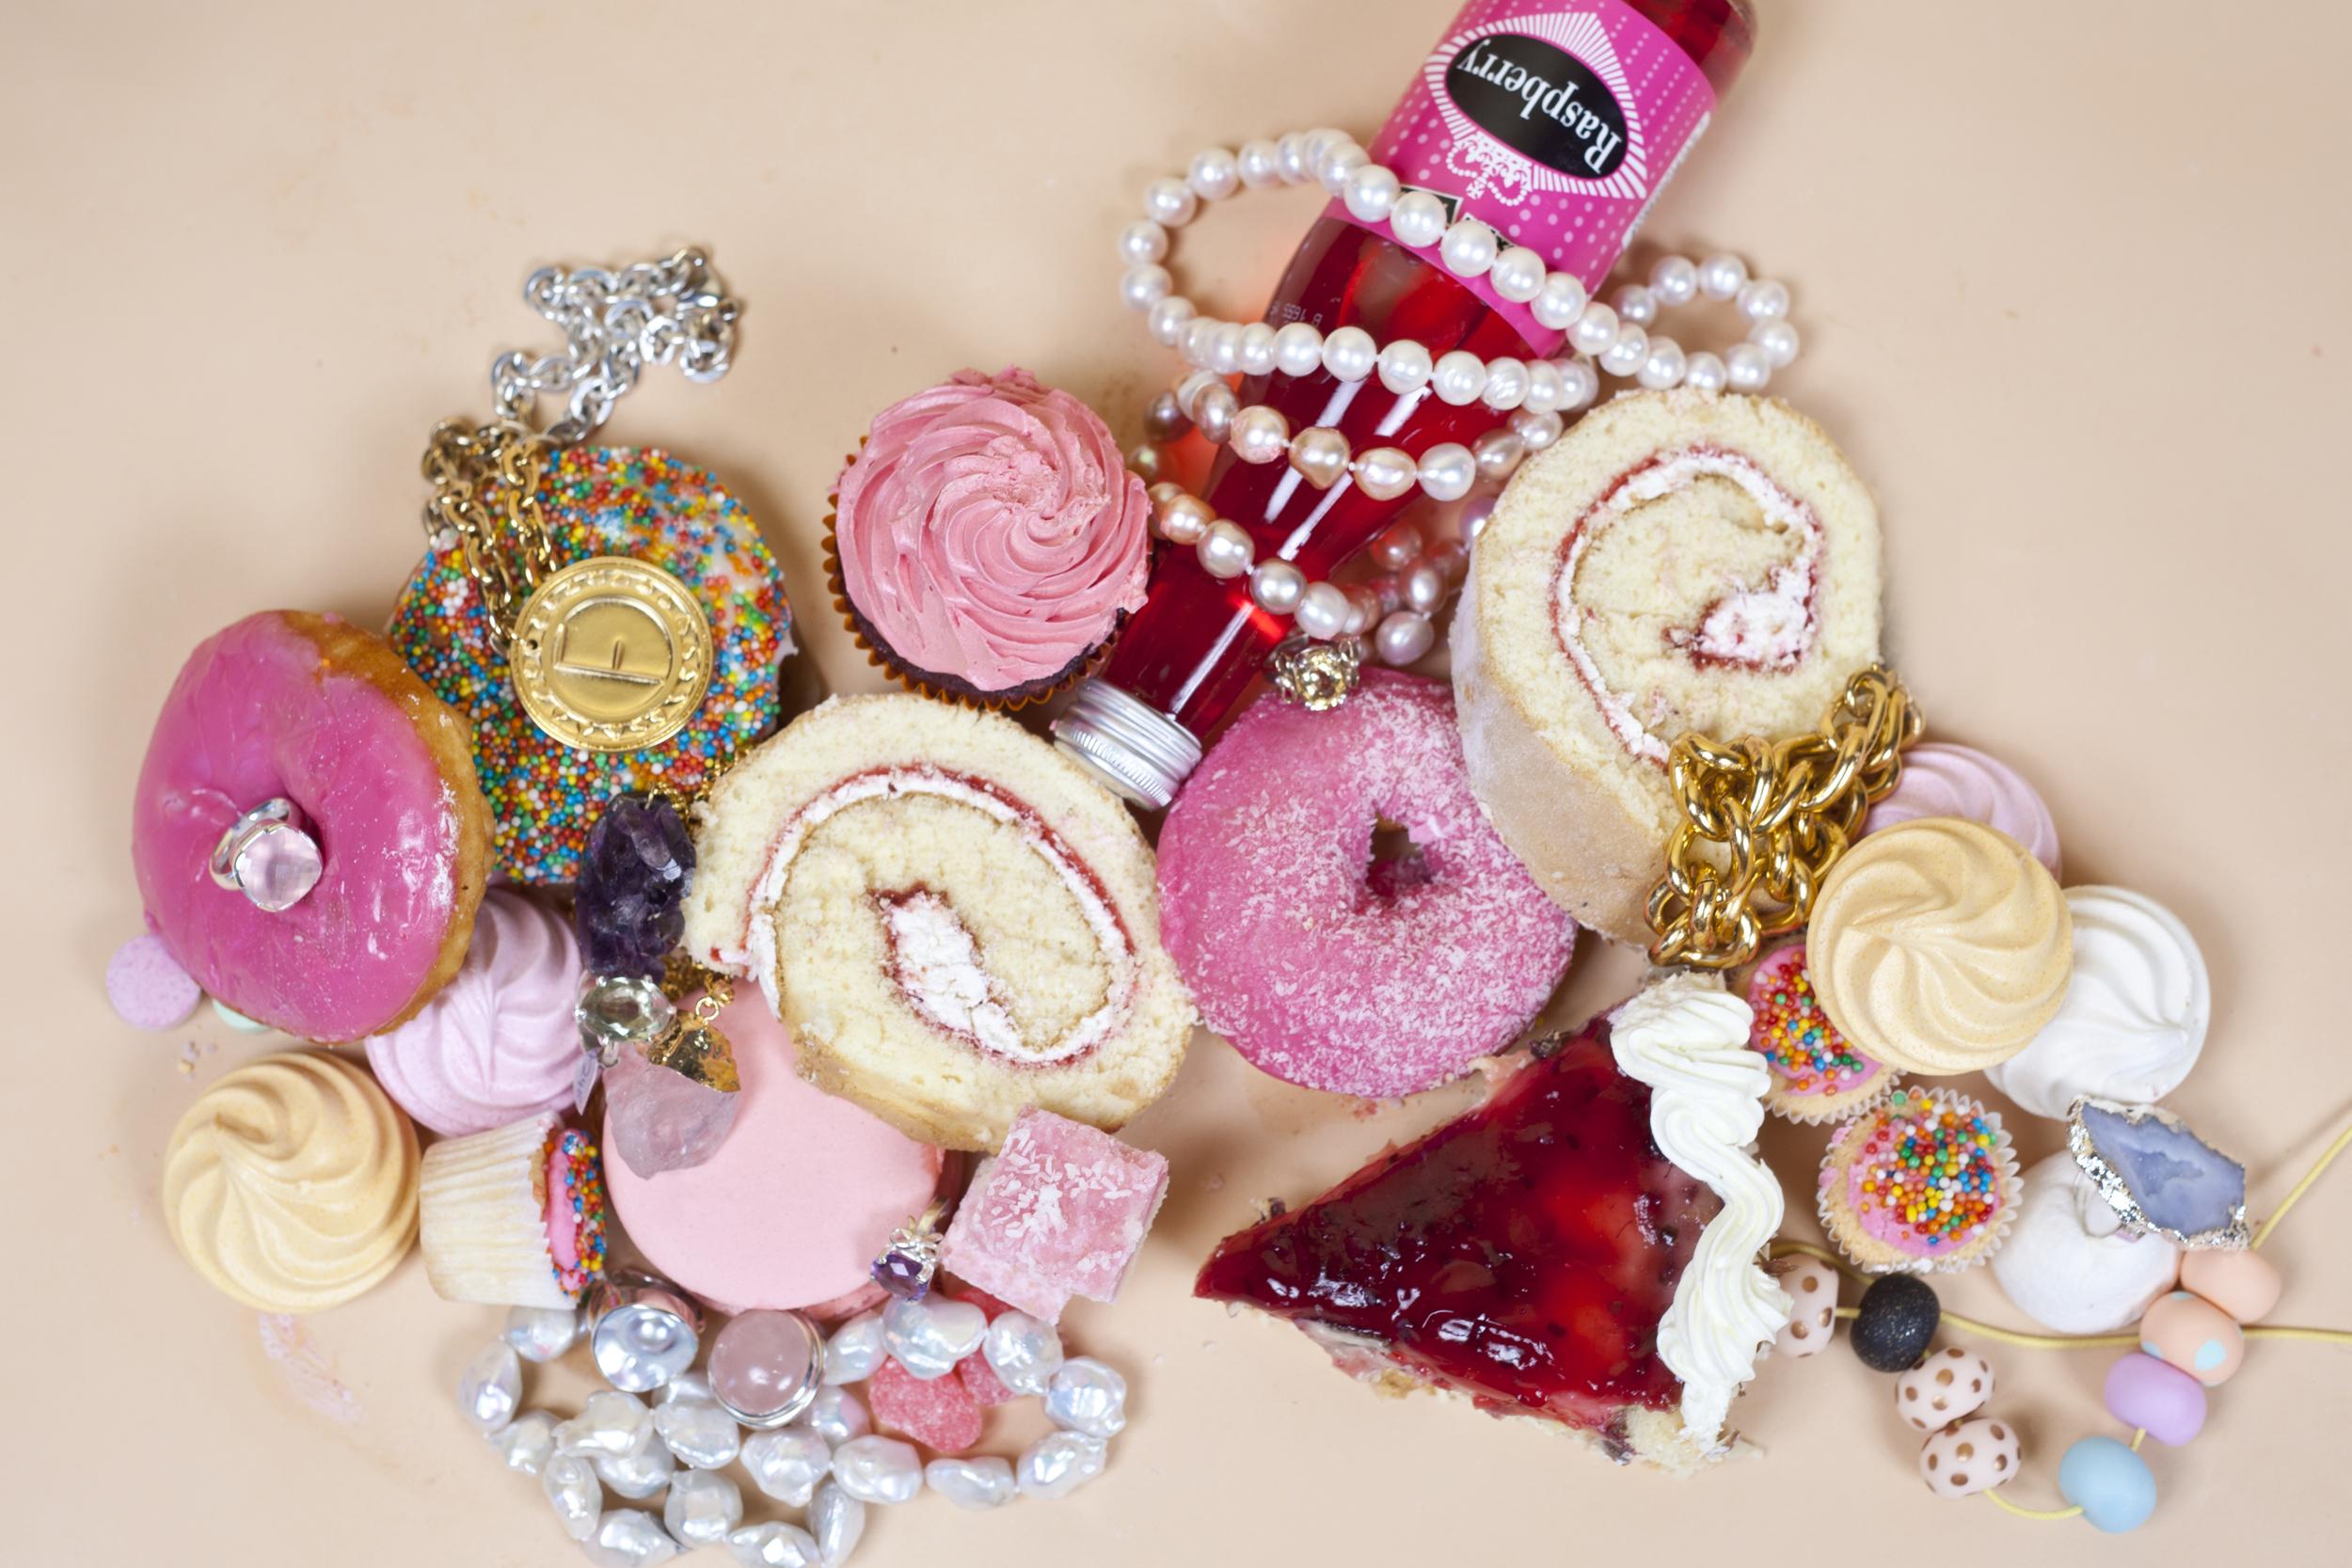 CapMag-Jewelry-Feb14-AChurch-81-edited.jpg